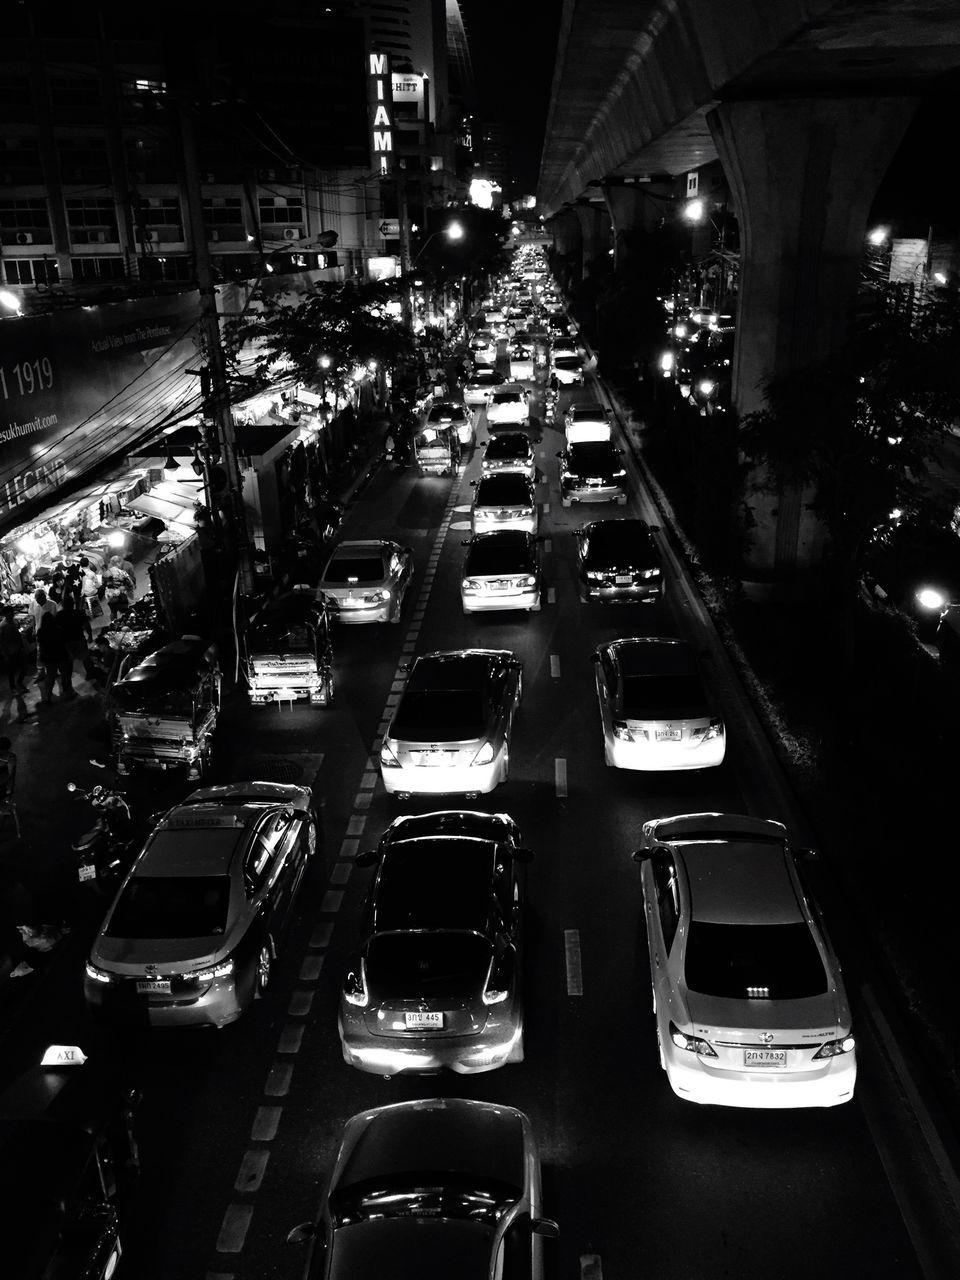 car, transportation, illuminated, land vehicle, traffic, night, mode of transport, street, road, rush hour, no people, city, outdoors